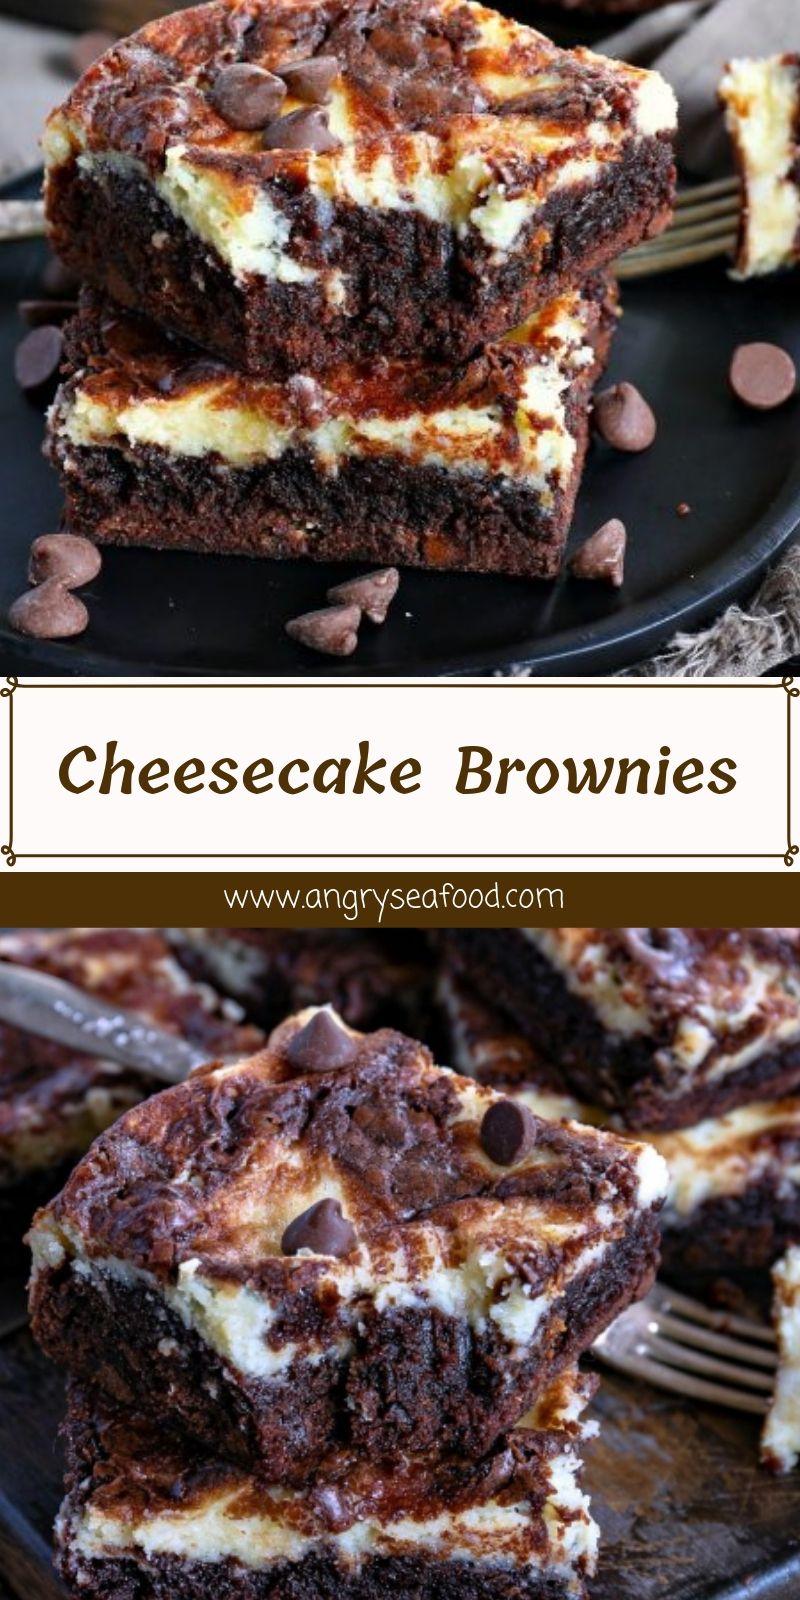 https://www.momontimeout.com/cheesecake-brownies-recipe/